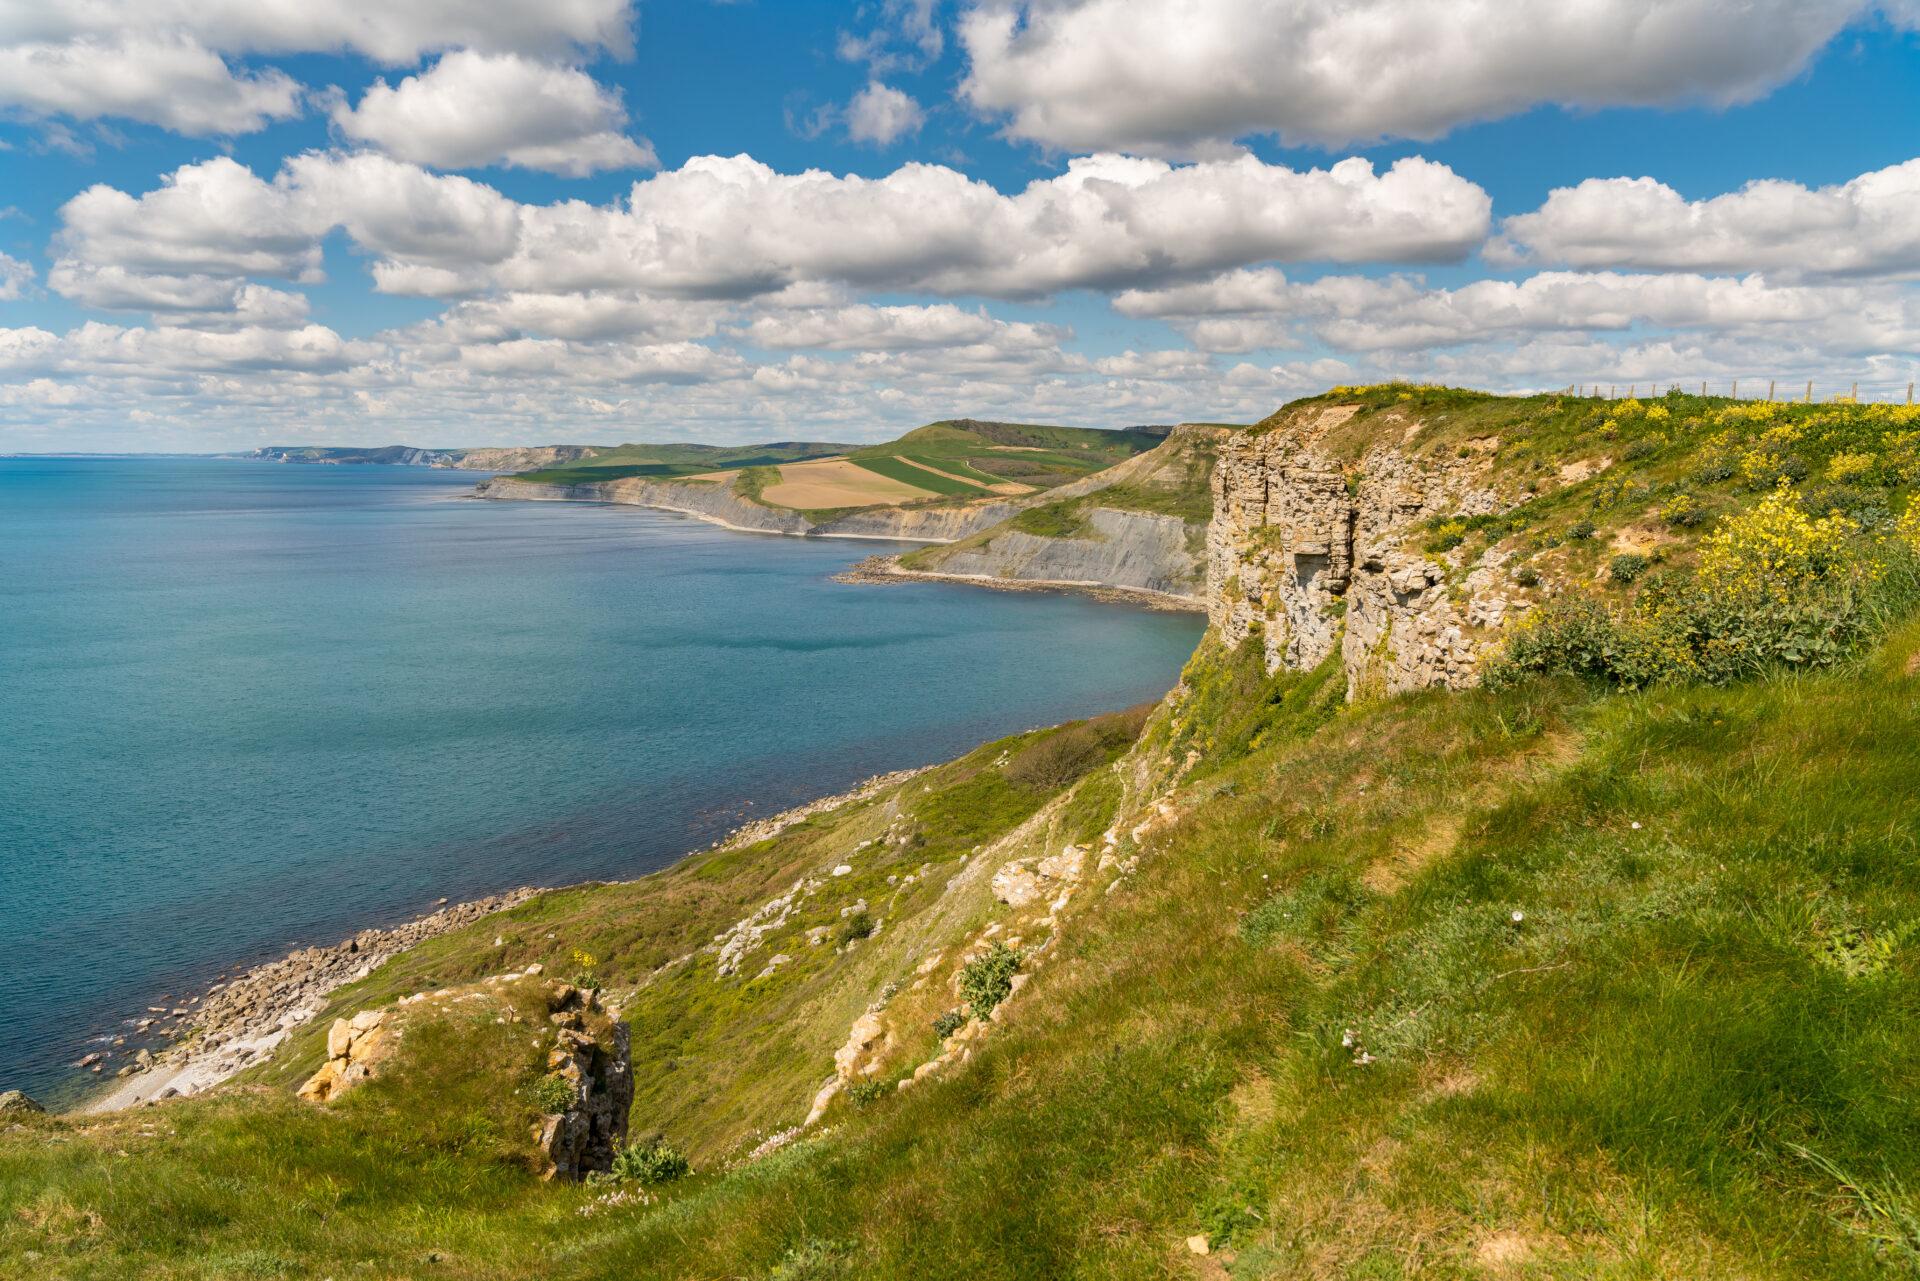 South West Coast Path with a view over the Jurassic Coast and Emmett's Hill, near Worth Matravers, Jurassic Coast, Dorset, UK